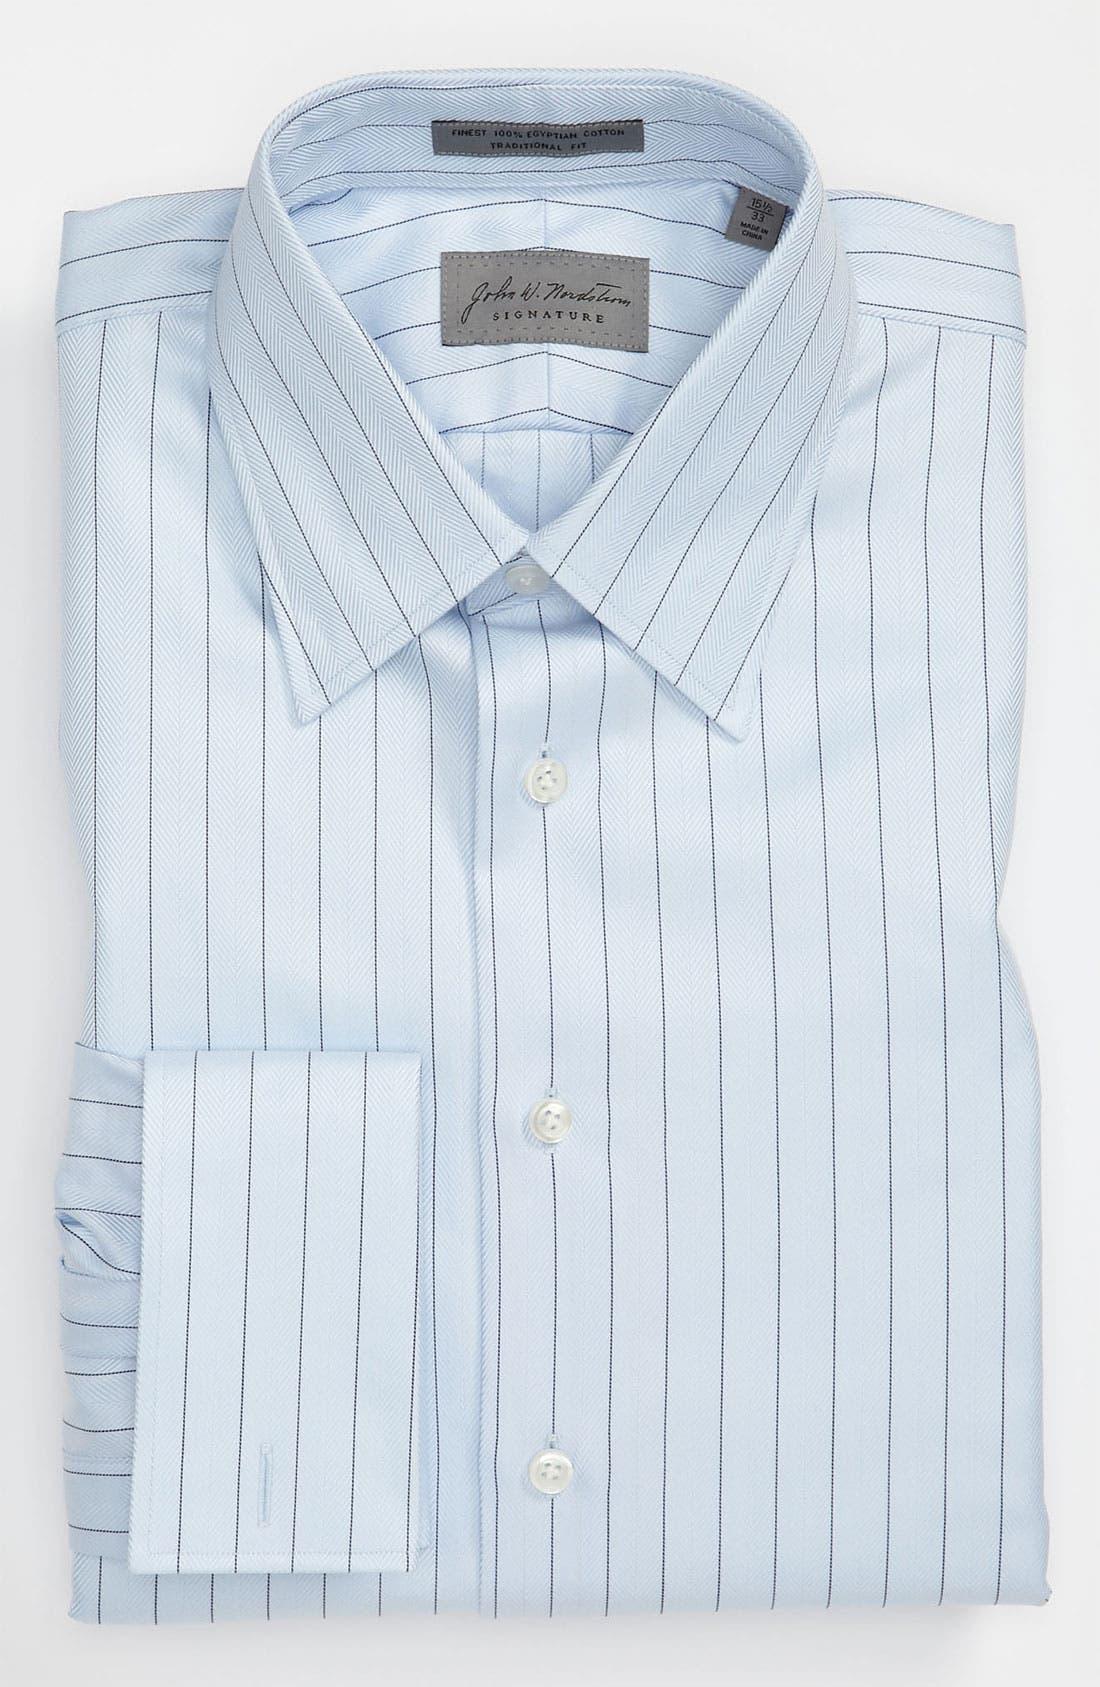 Alternate Image 1 Selected - John W. Nordstrom® Signature Traditional Fit Dress Shirt